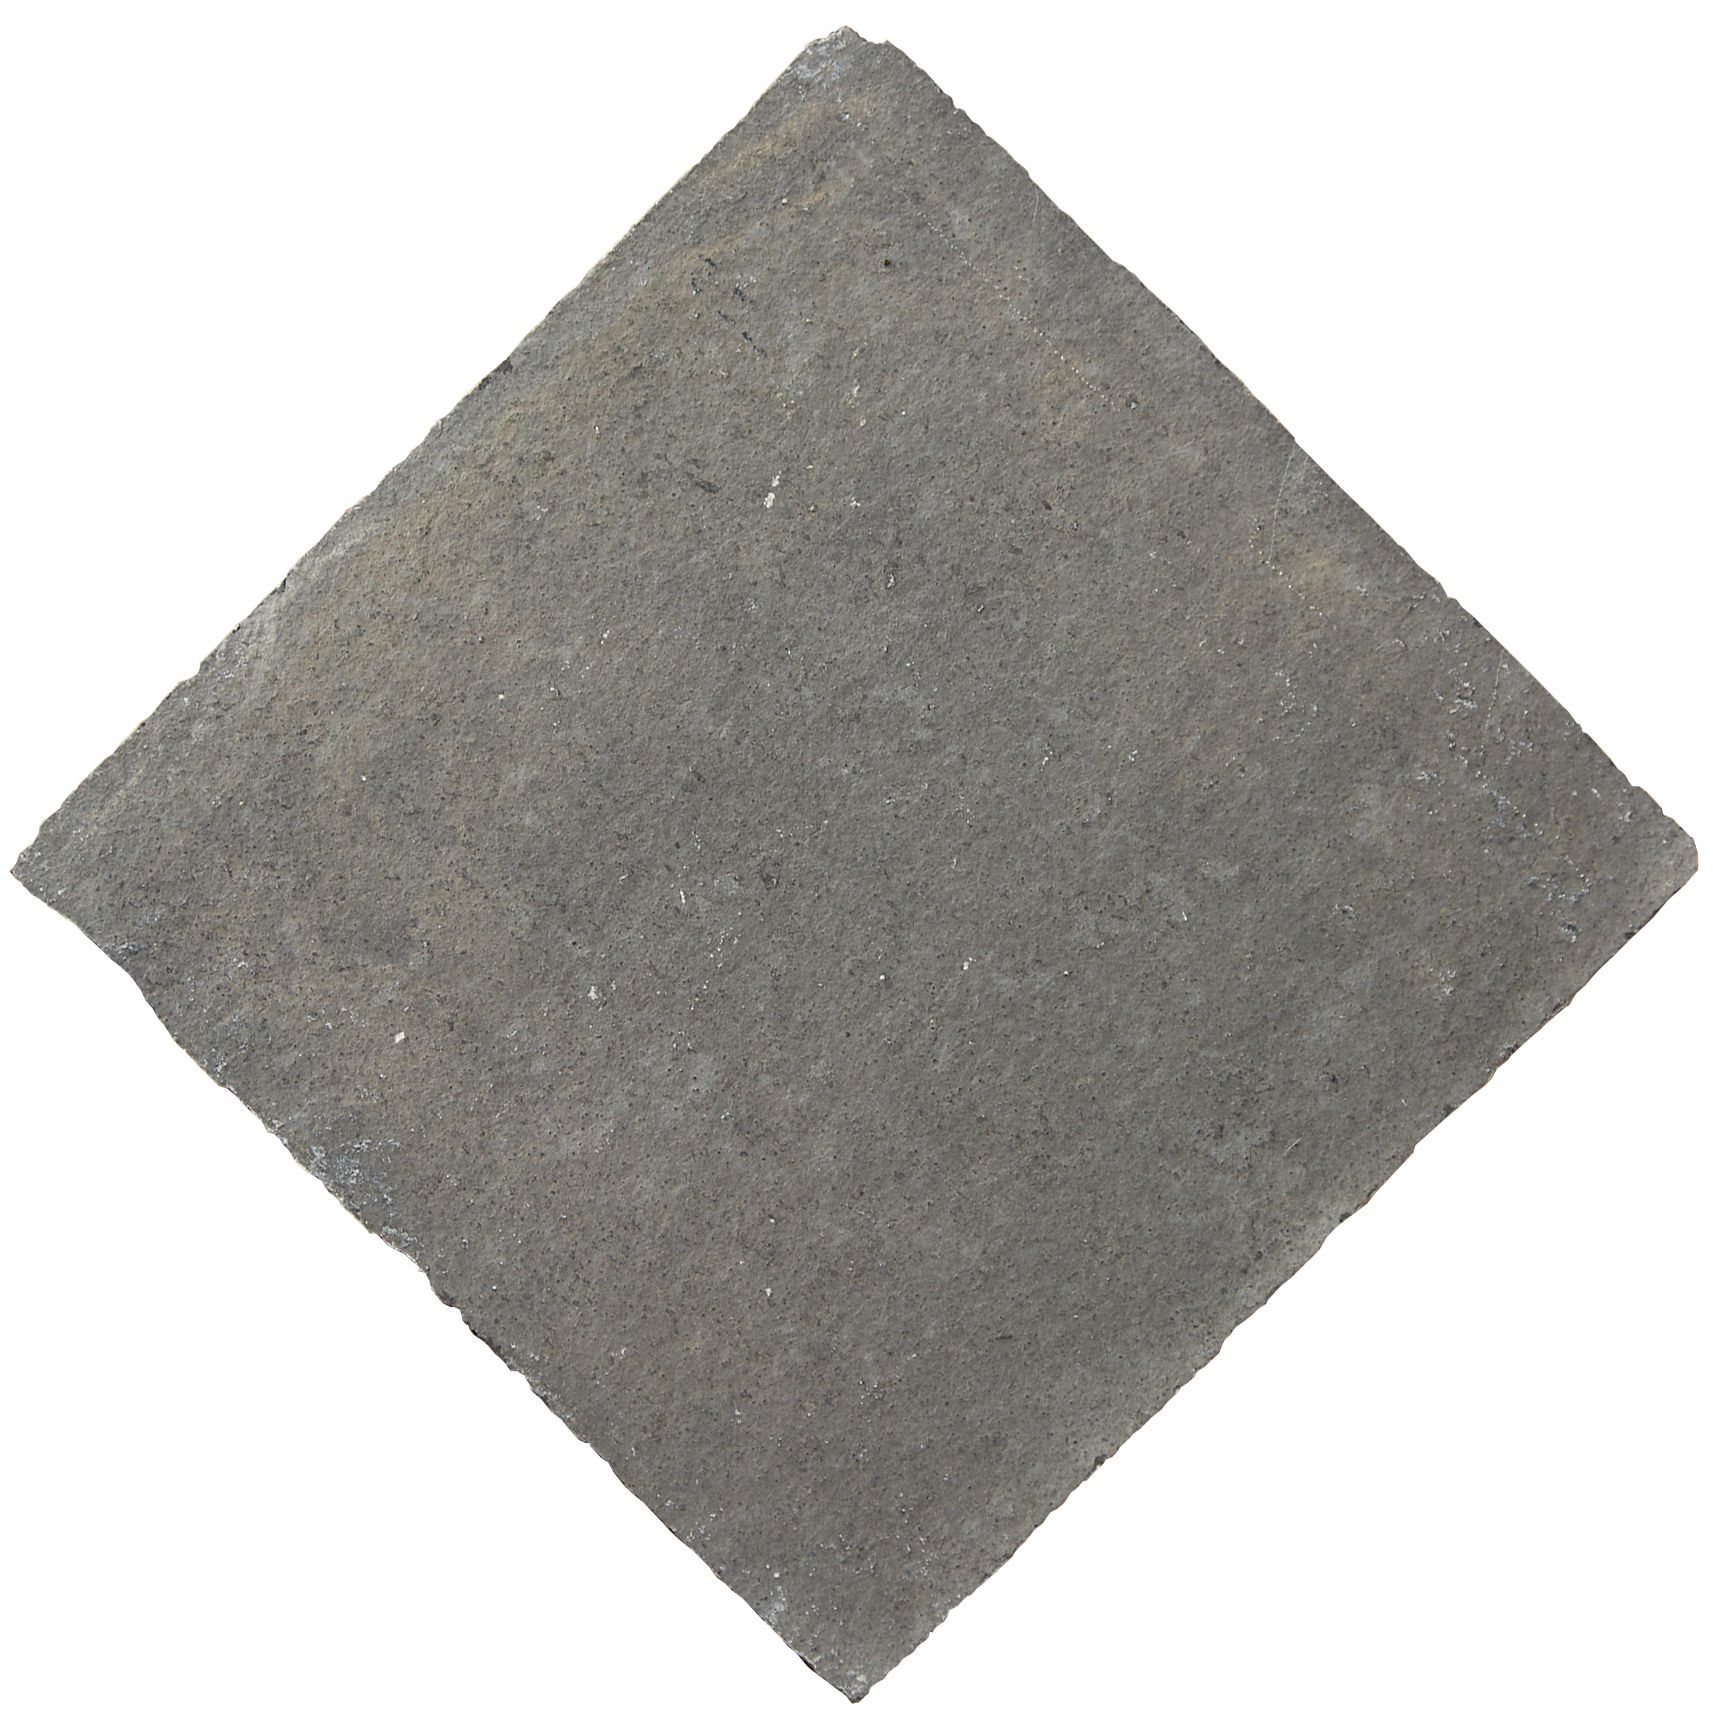 Blue Black Natural Limestone Paving Slab L 600 W 300mm